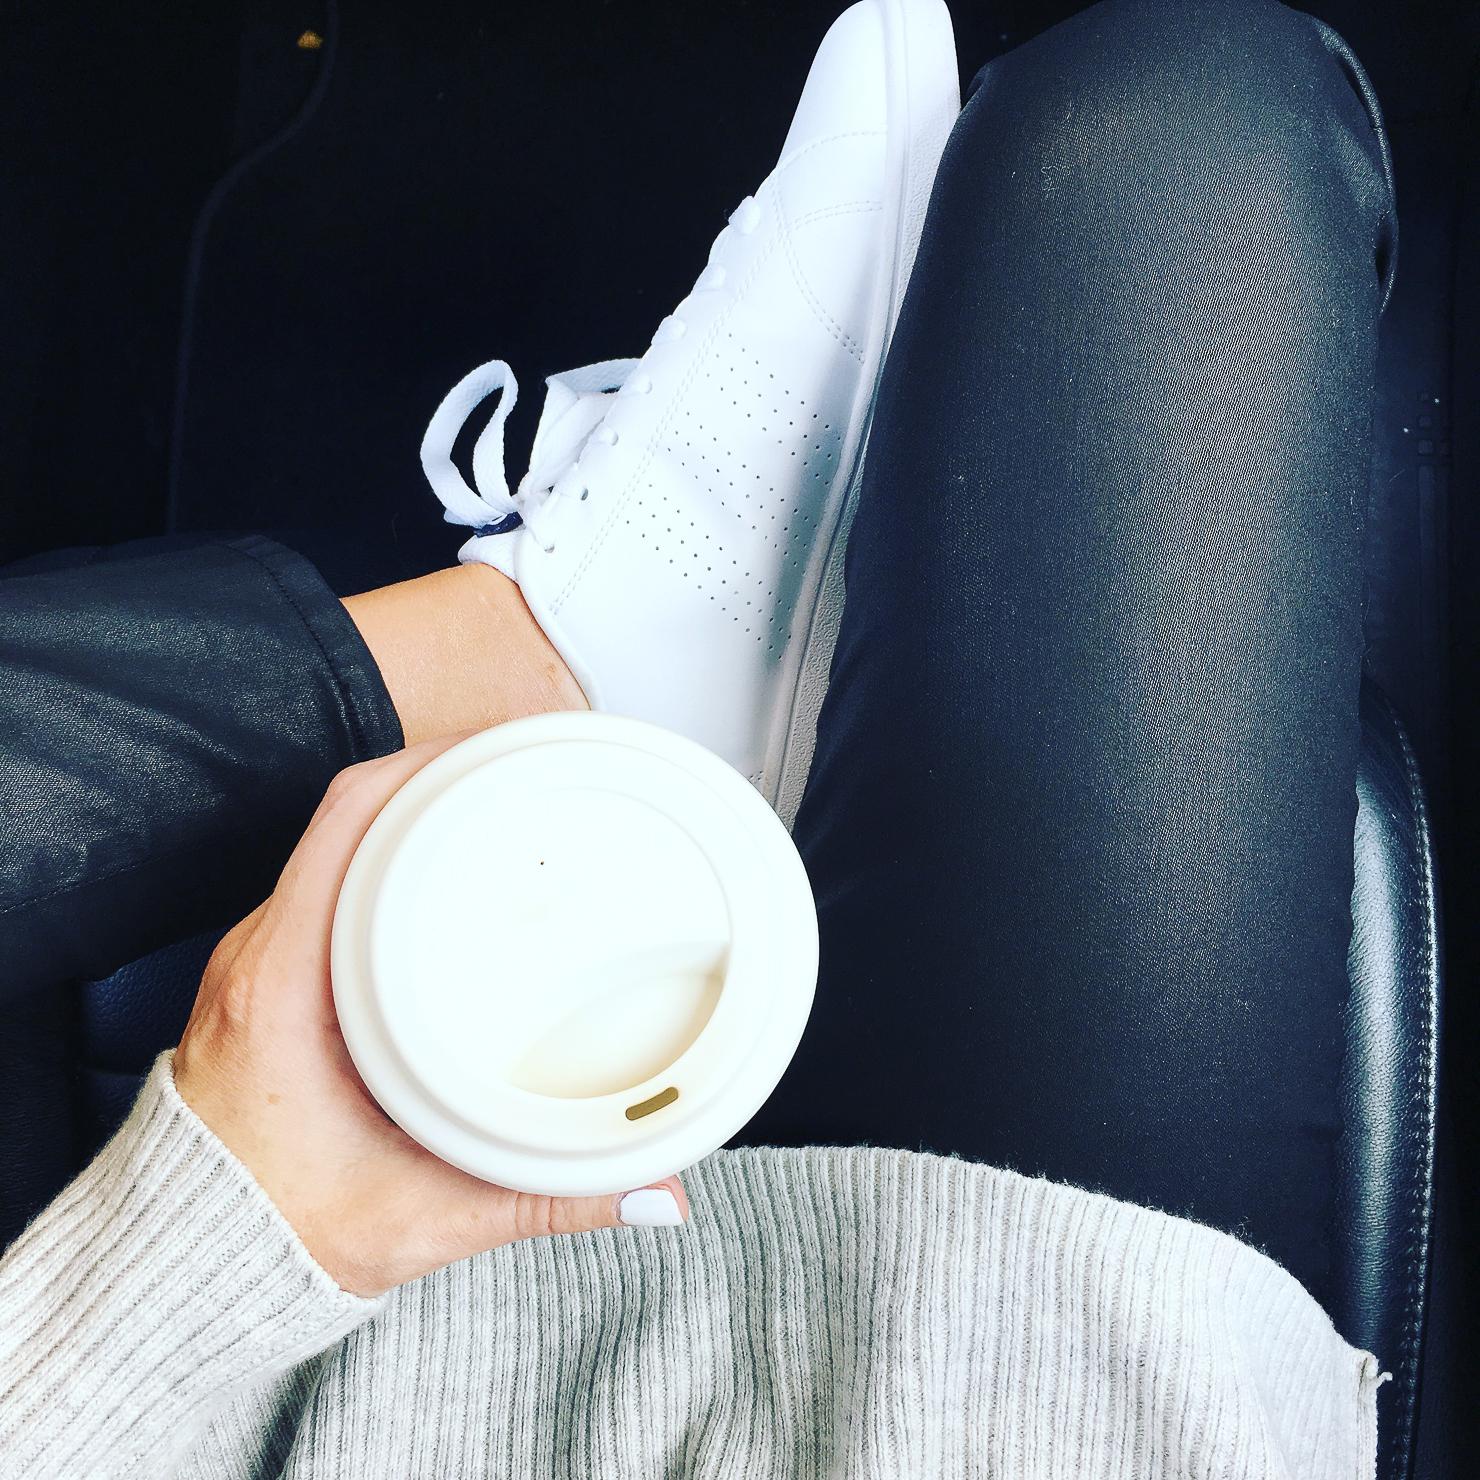 coffee-break-adidas-and-leather-leggings-